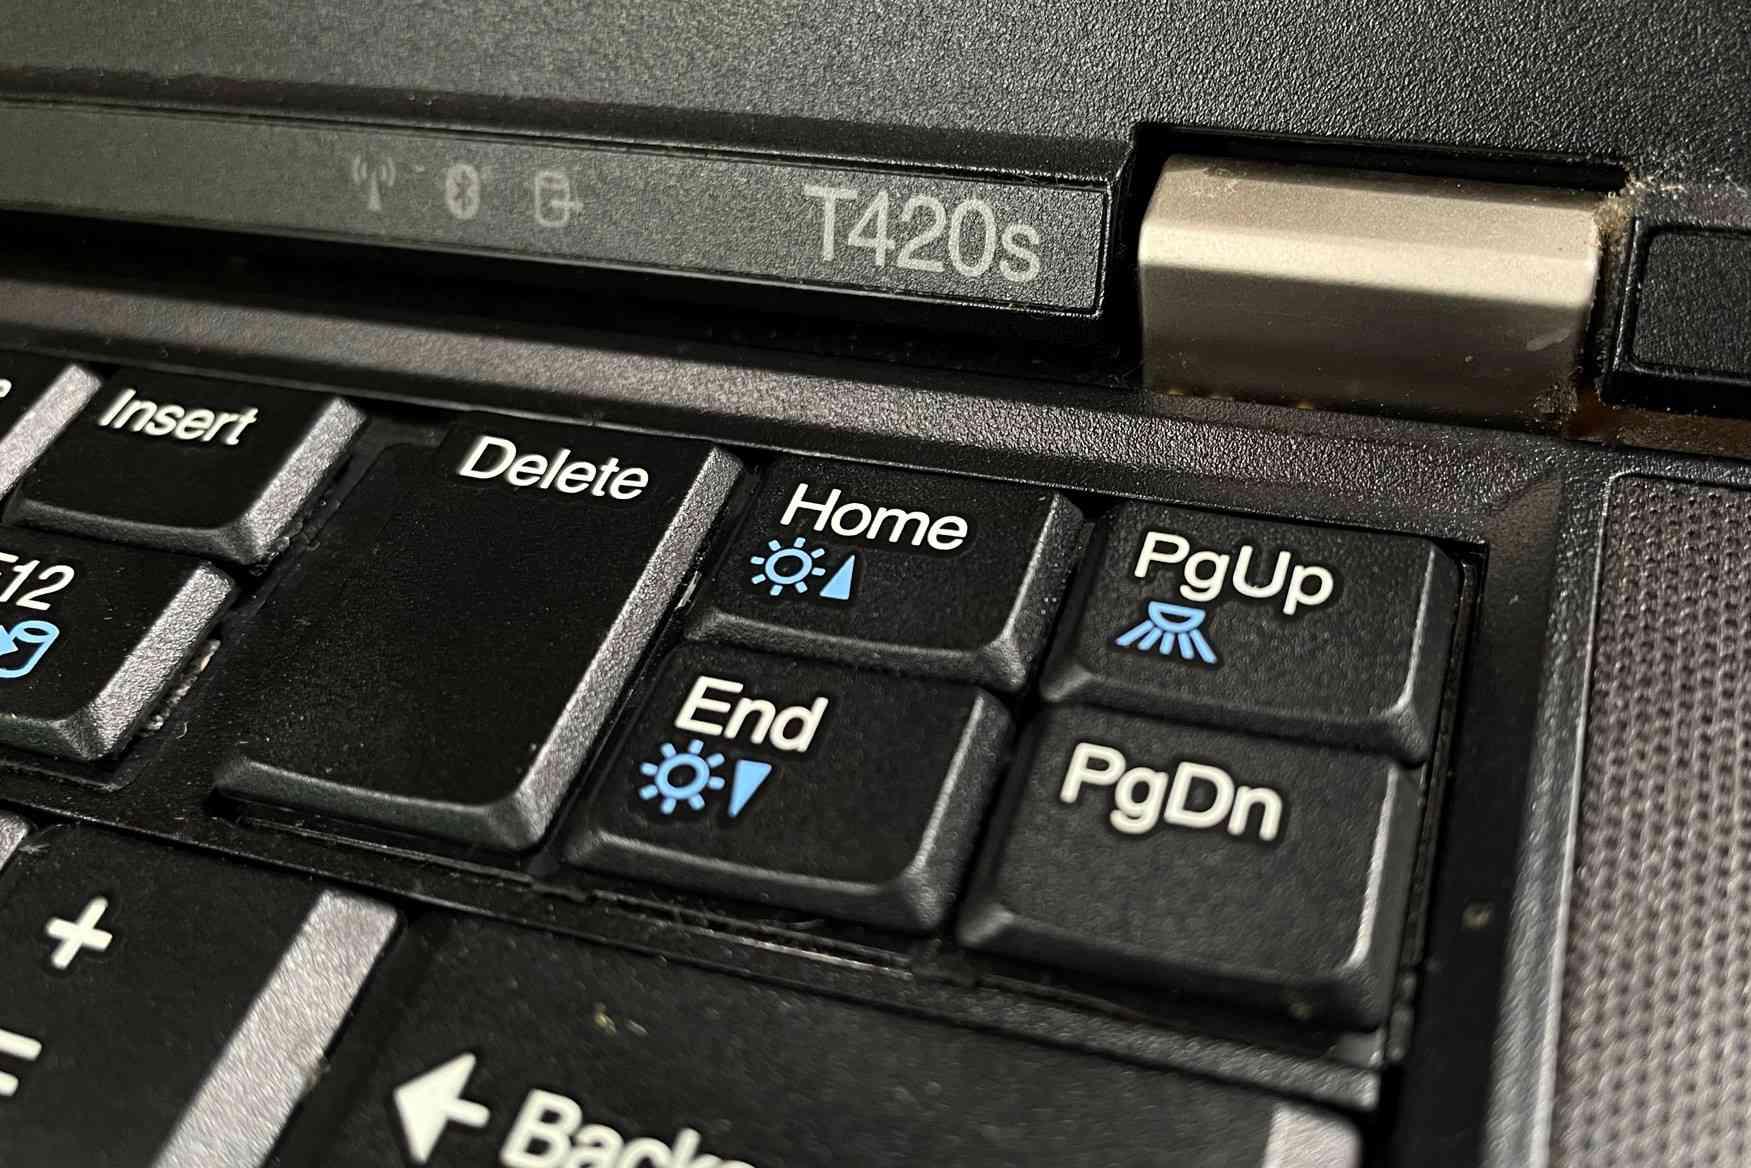 A photo of the Lenovo ThinkLight button on a Lenovo ThinkPad T420s